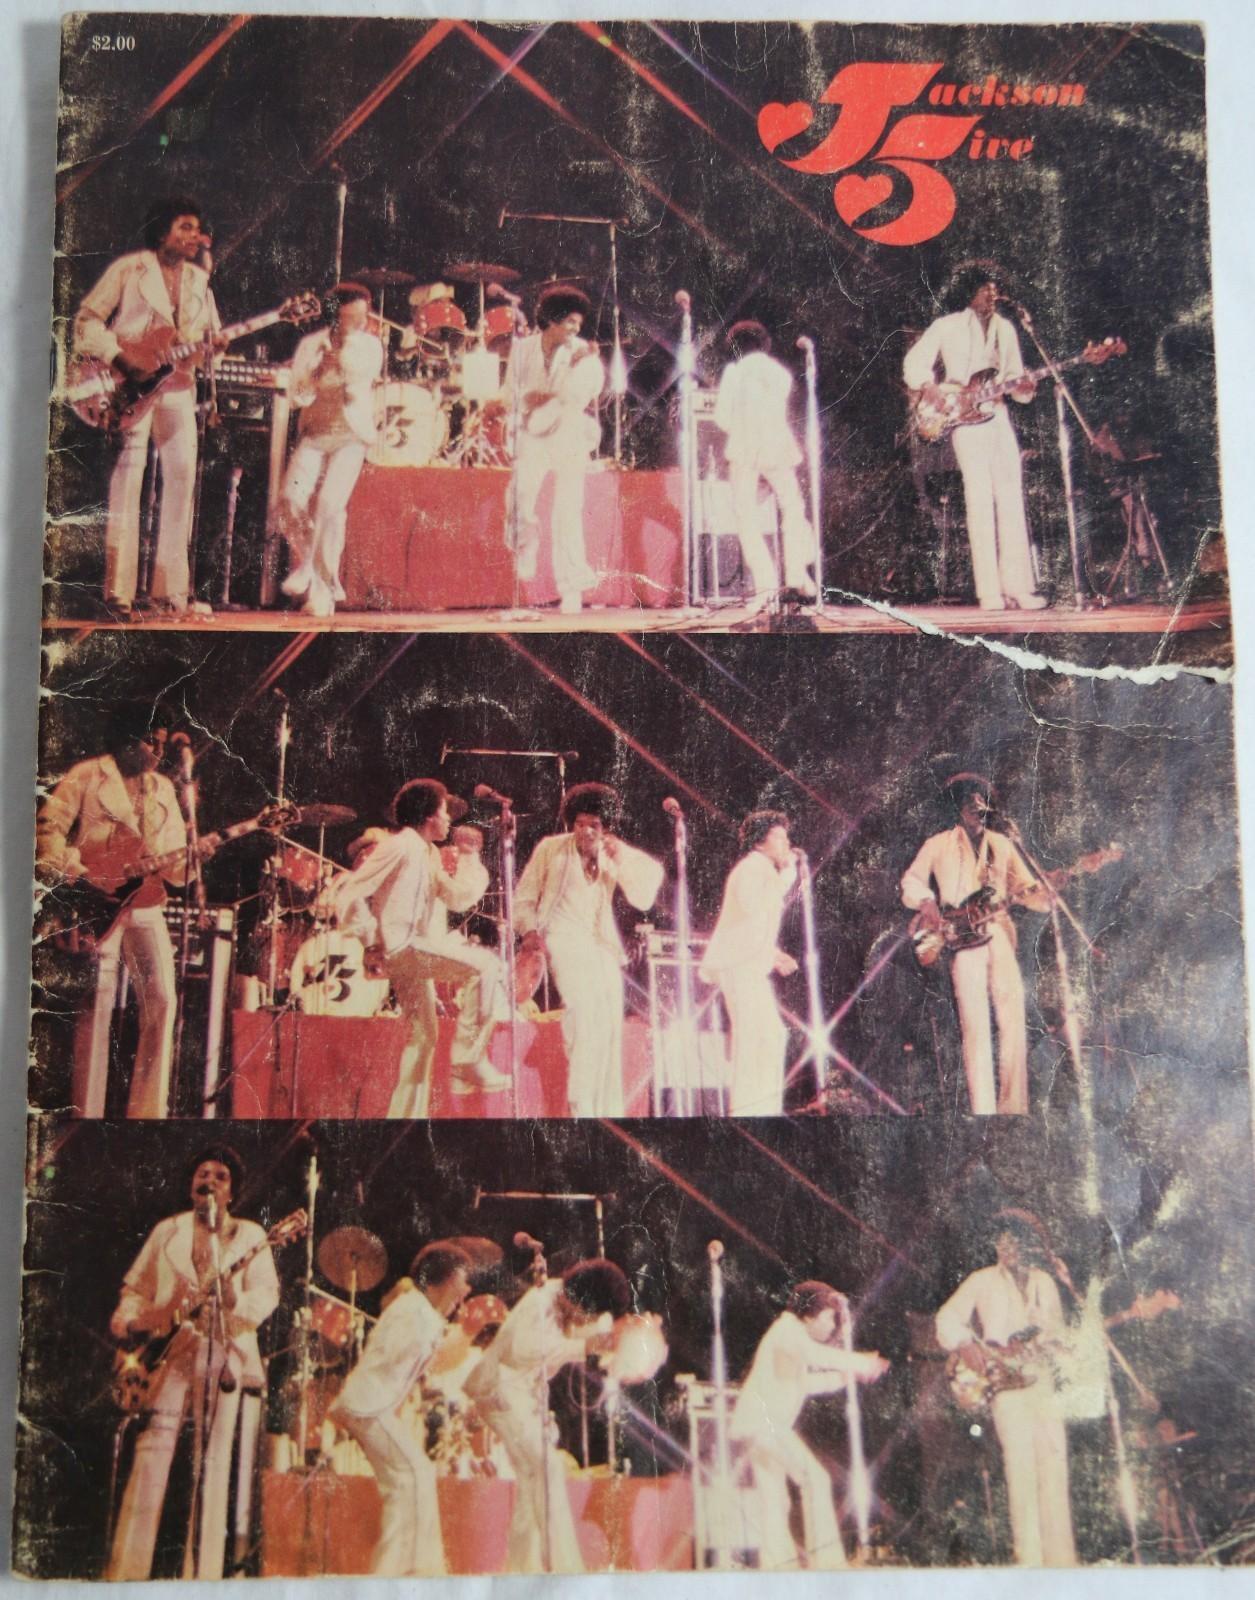 Jackson 5 концерт Tour Program